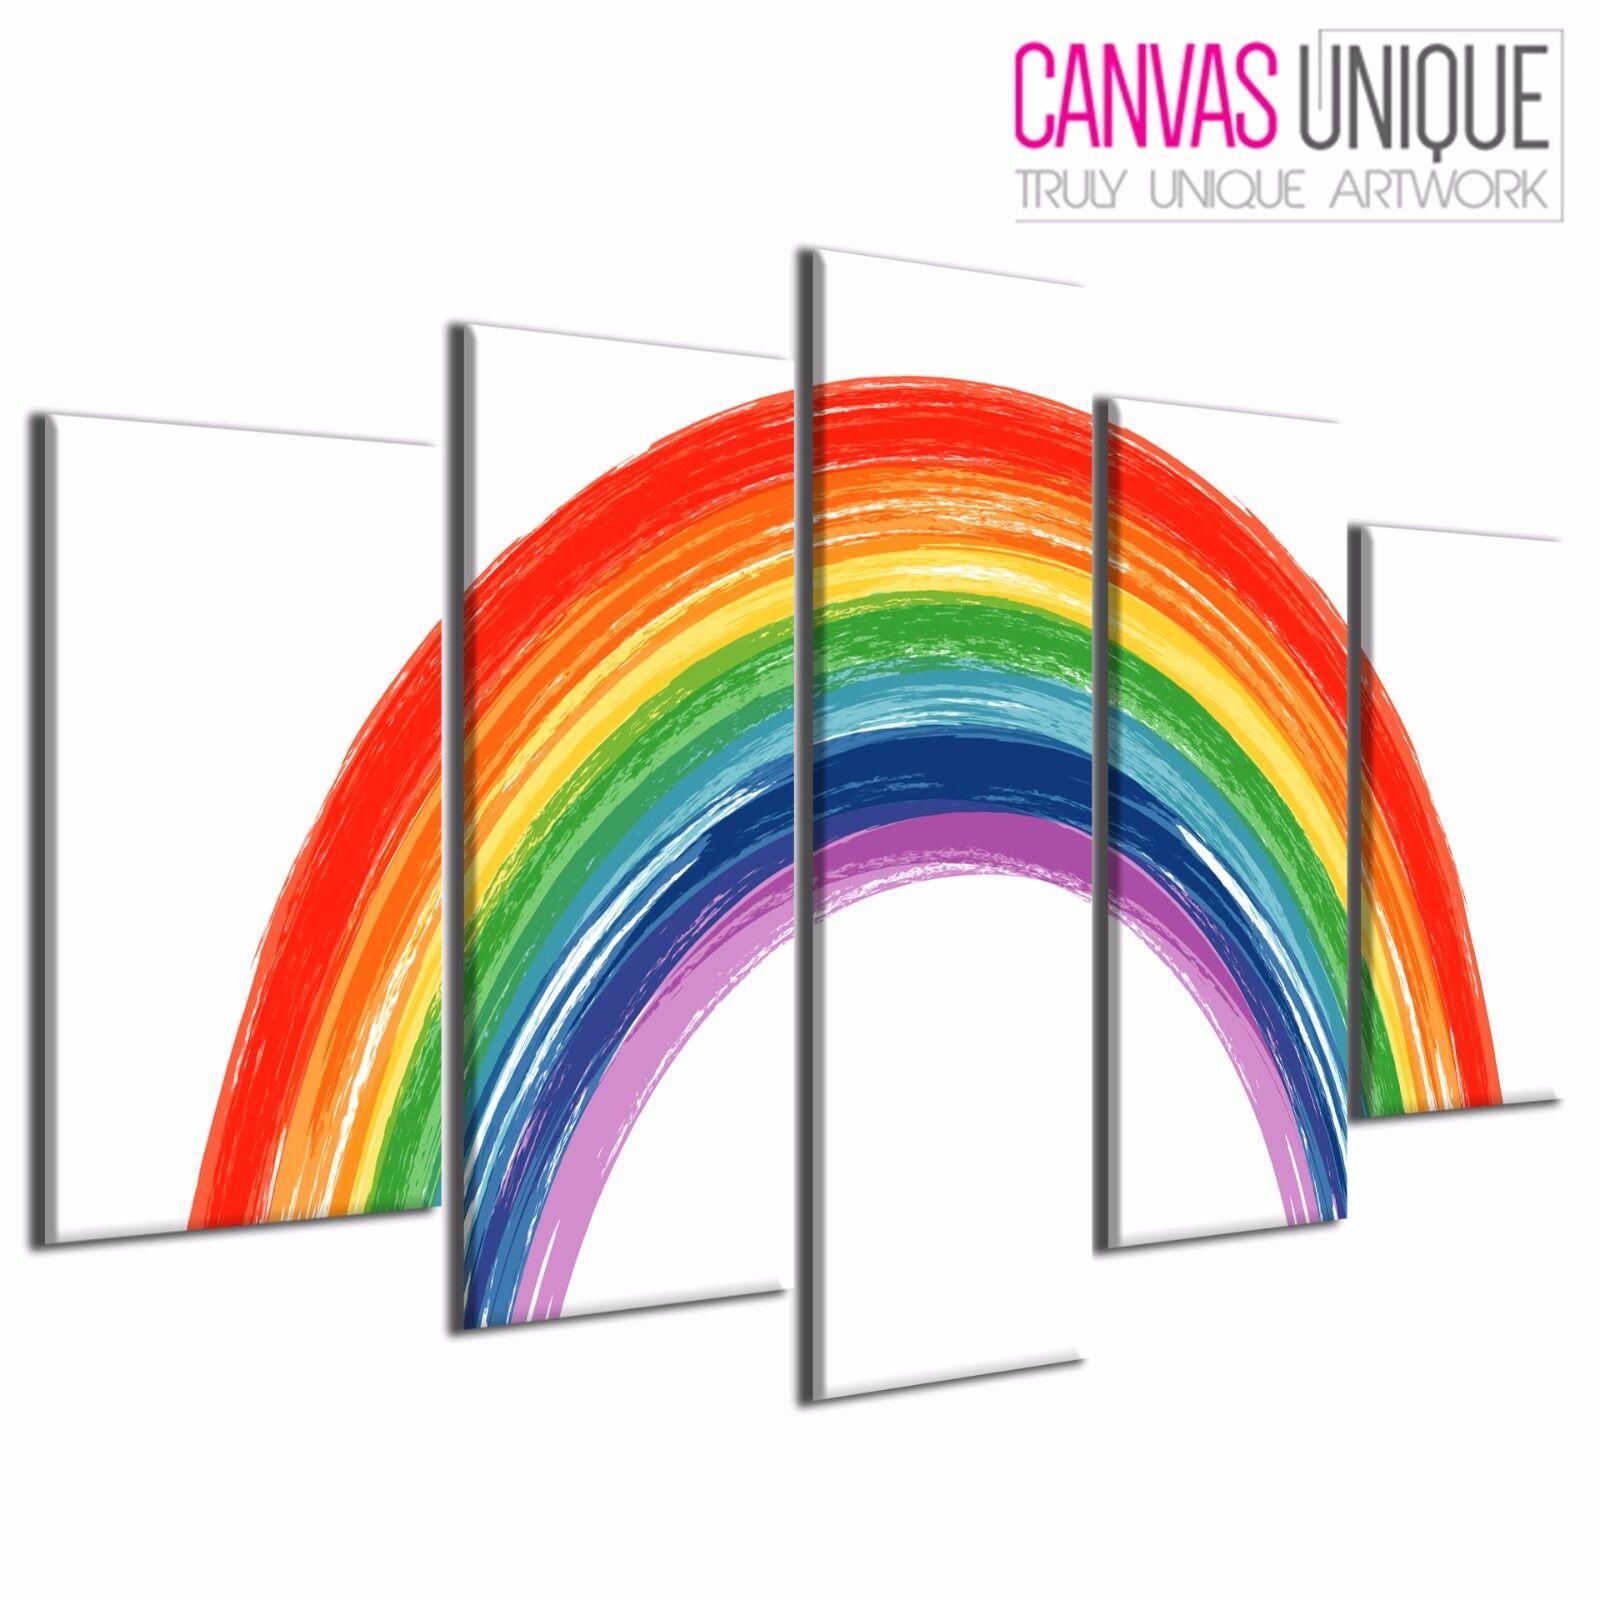 5PAB965 Painted Rainbow Kids Abstract Canvas Wall Art Framed Print